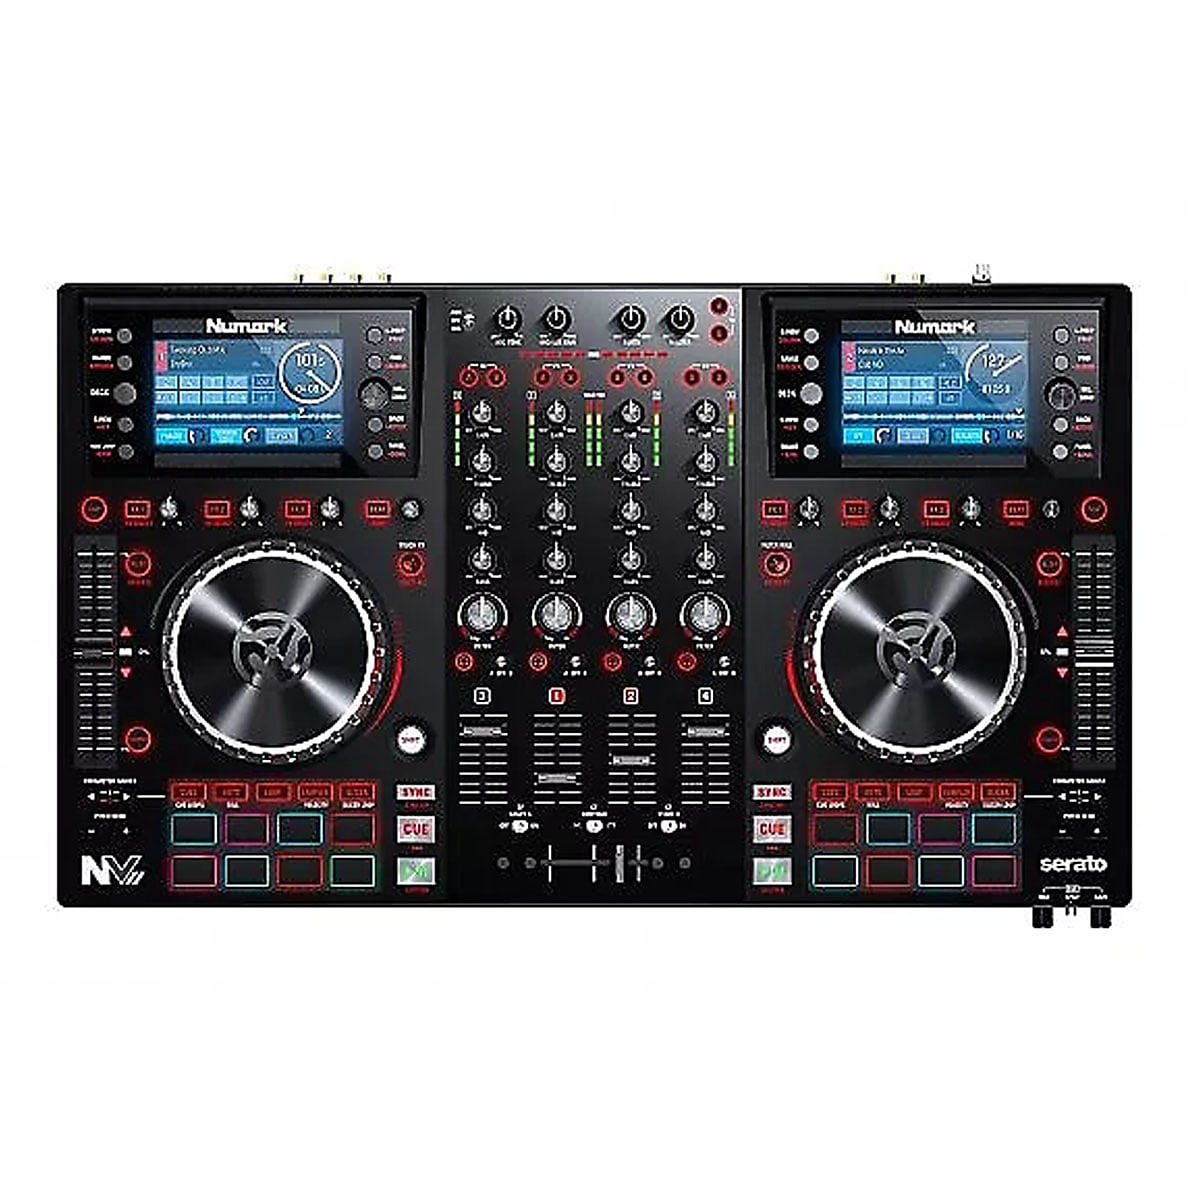 Numark NVII Intelligent Dual-Display controller for Serato DJ